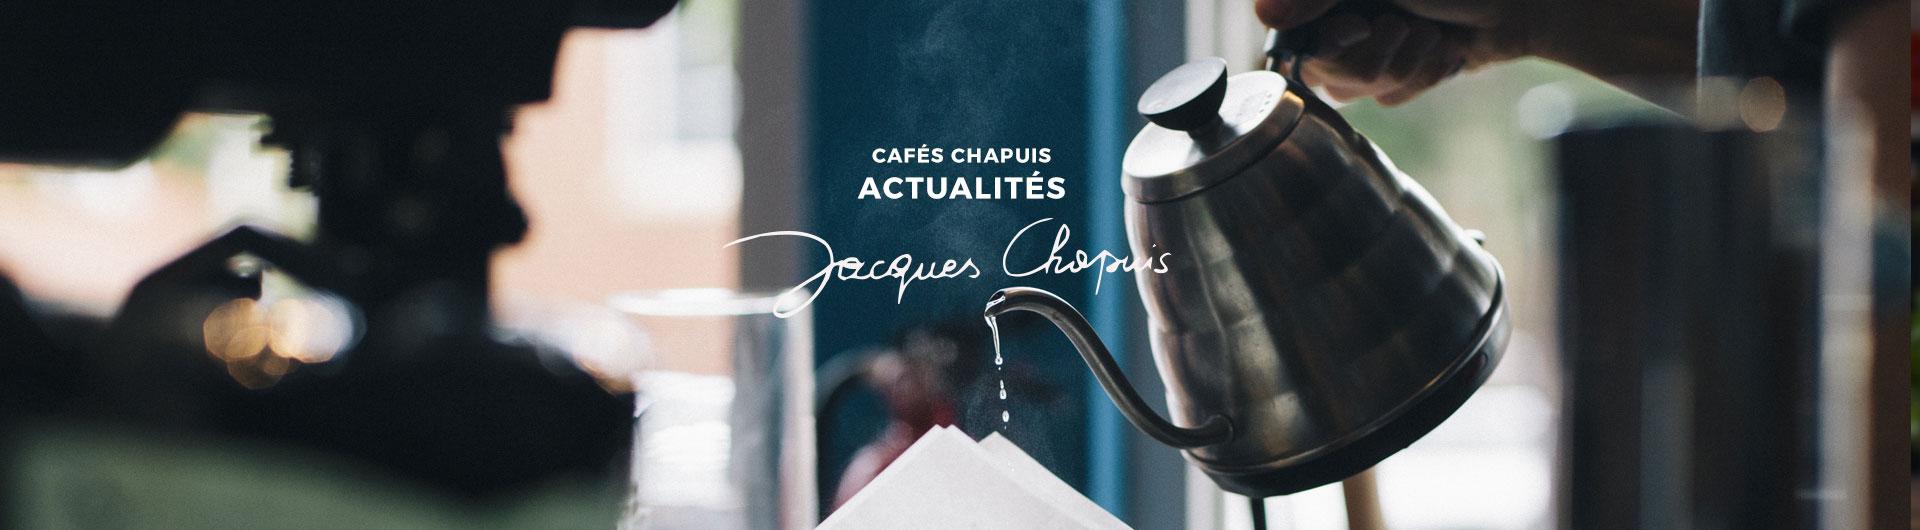 slide_chapuis